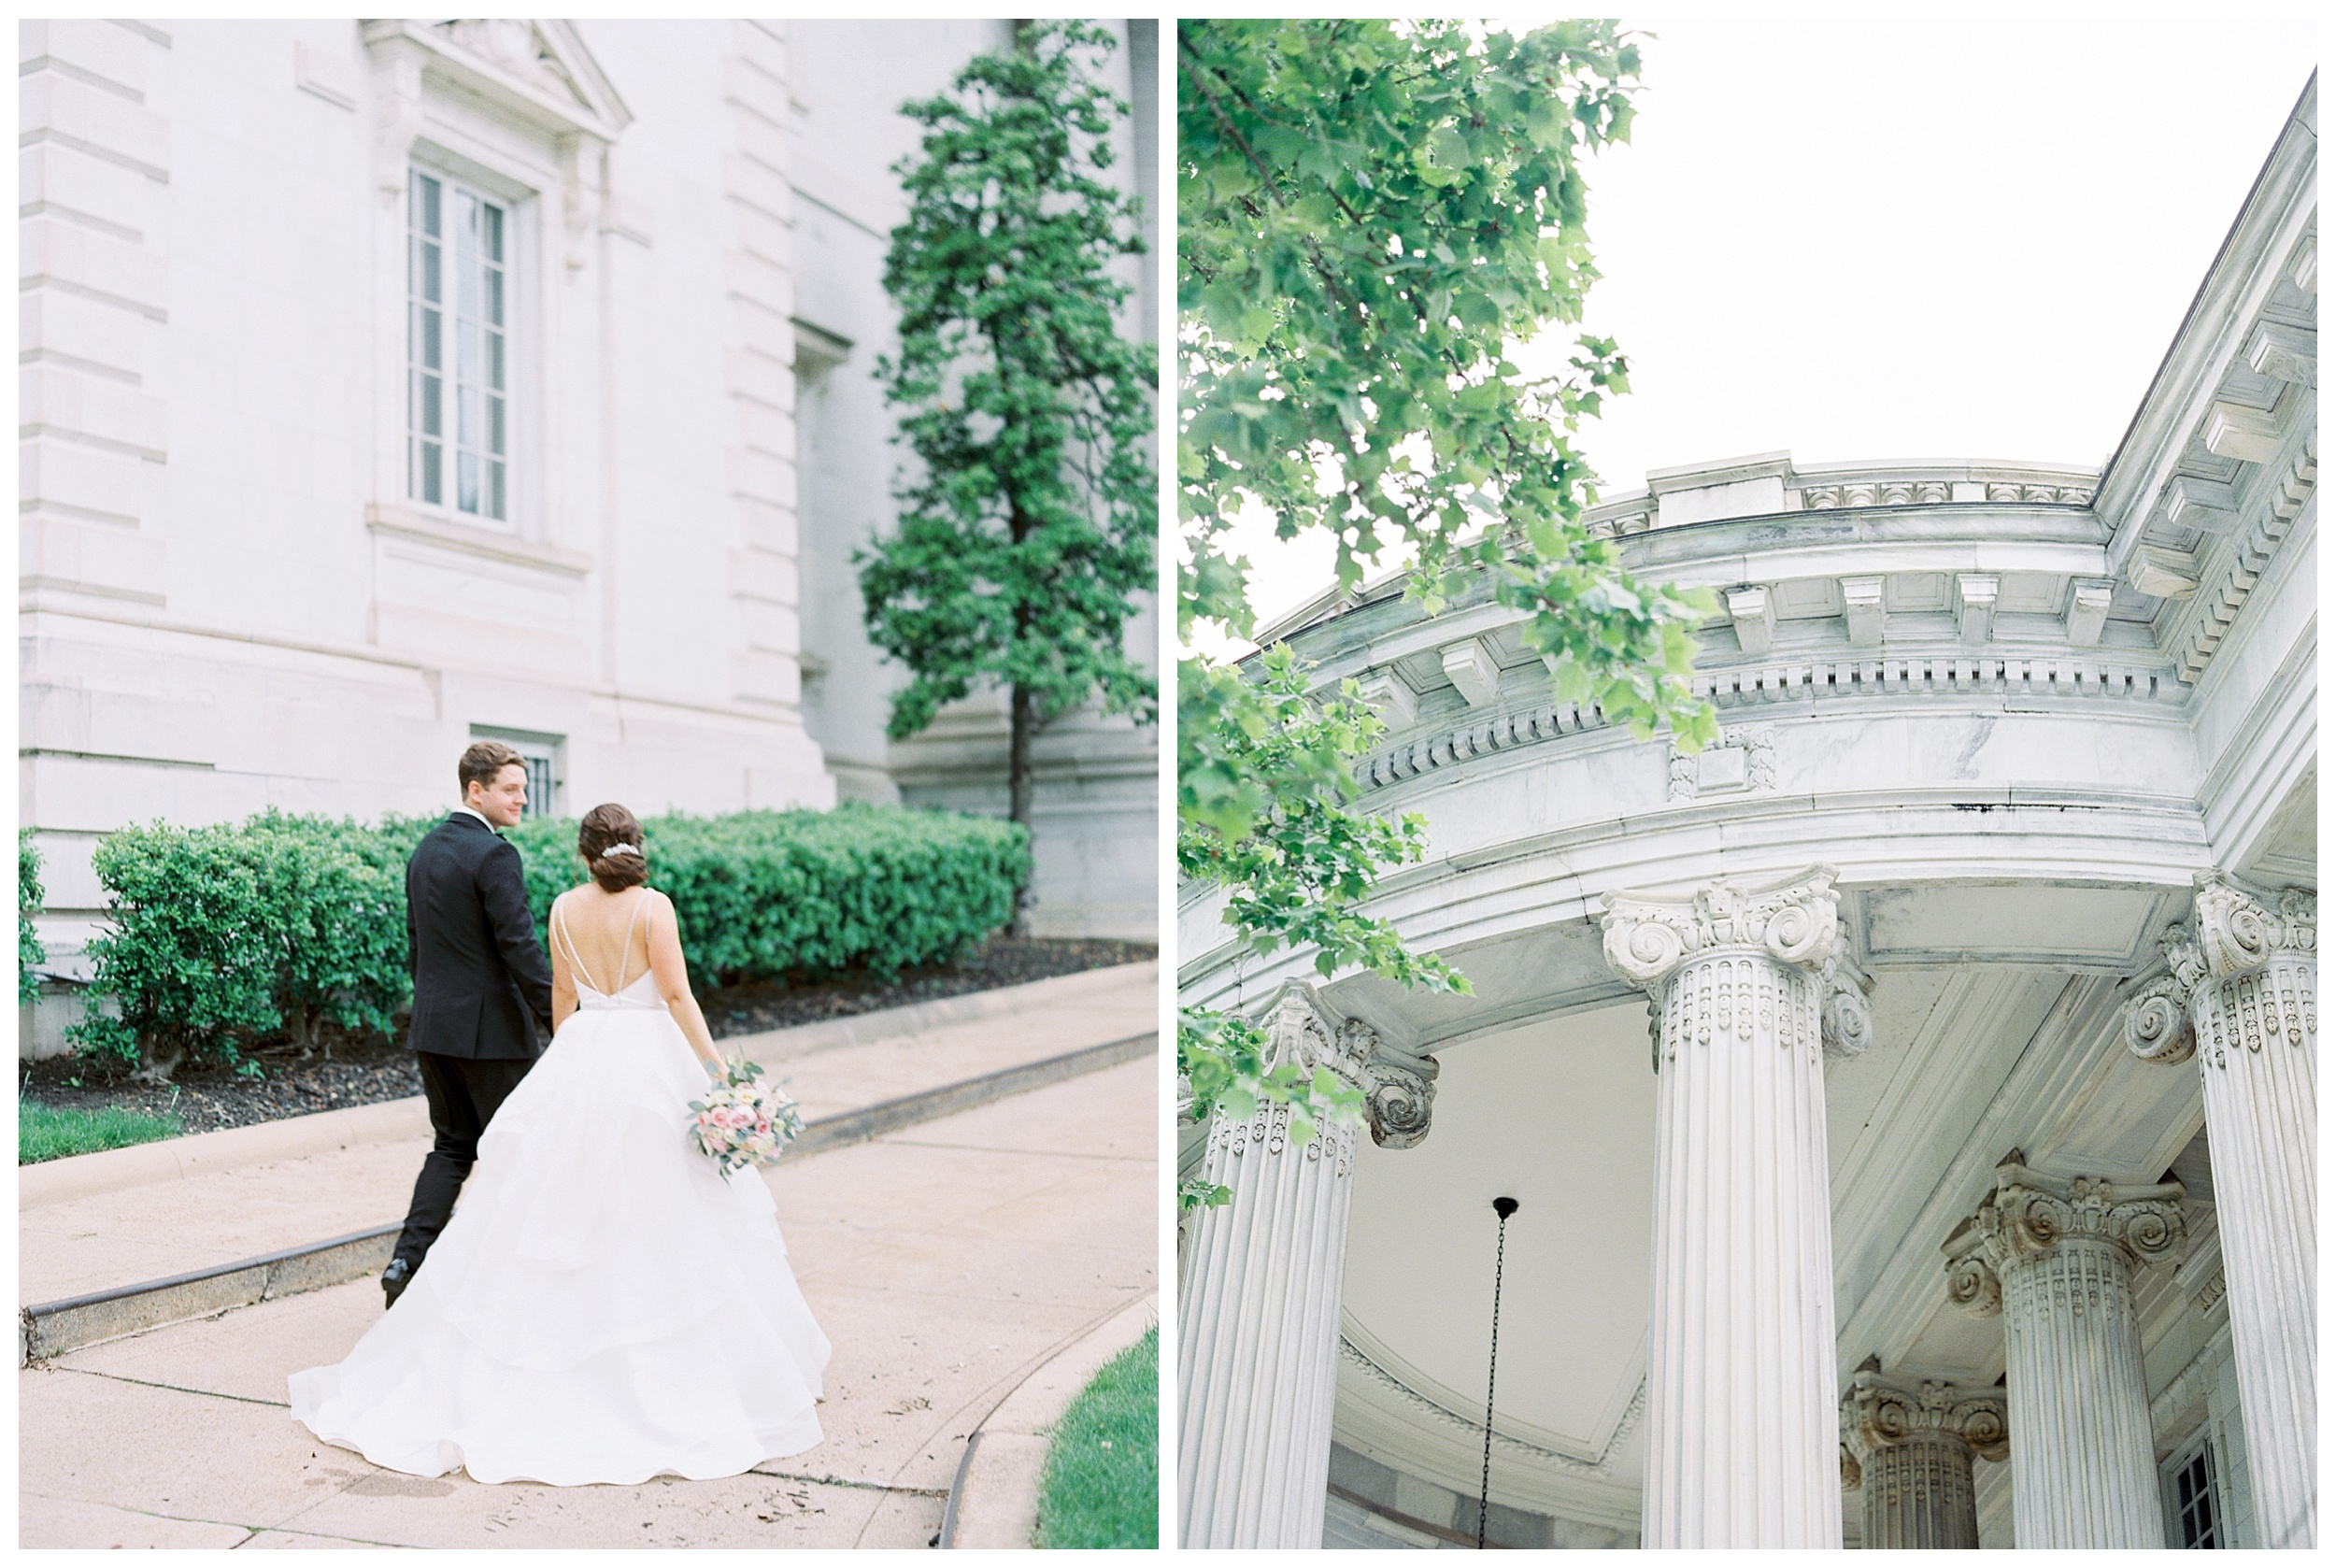 DAR Constitution Hall Wedding Wedding | Daughters of the American Revolution Wedding | District of Columbia Film Wedding Photographer Kir Tuben_0091.jpg